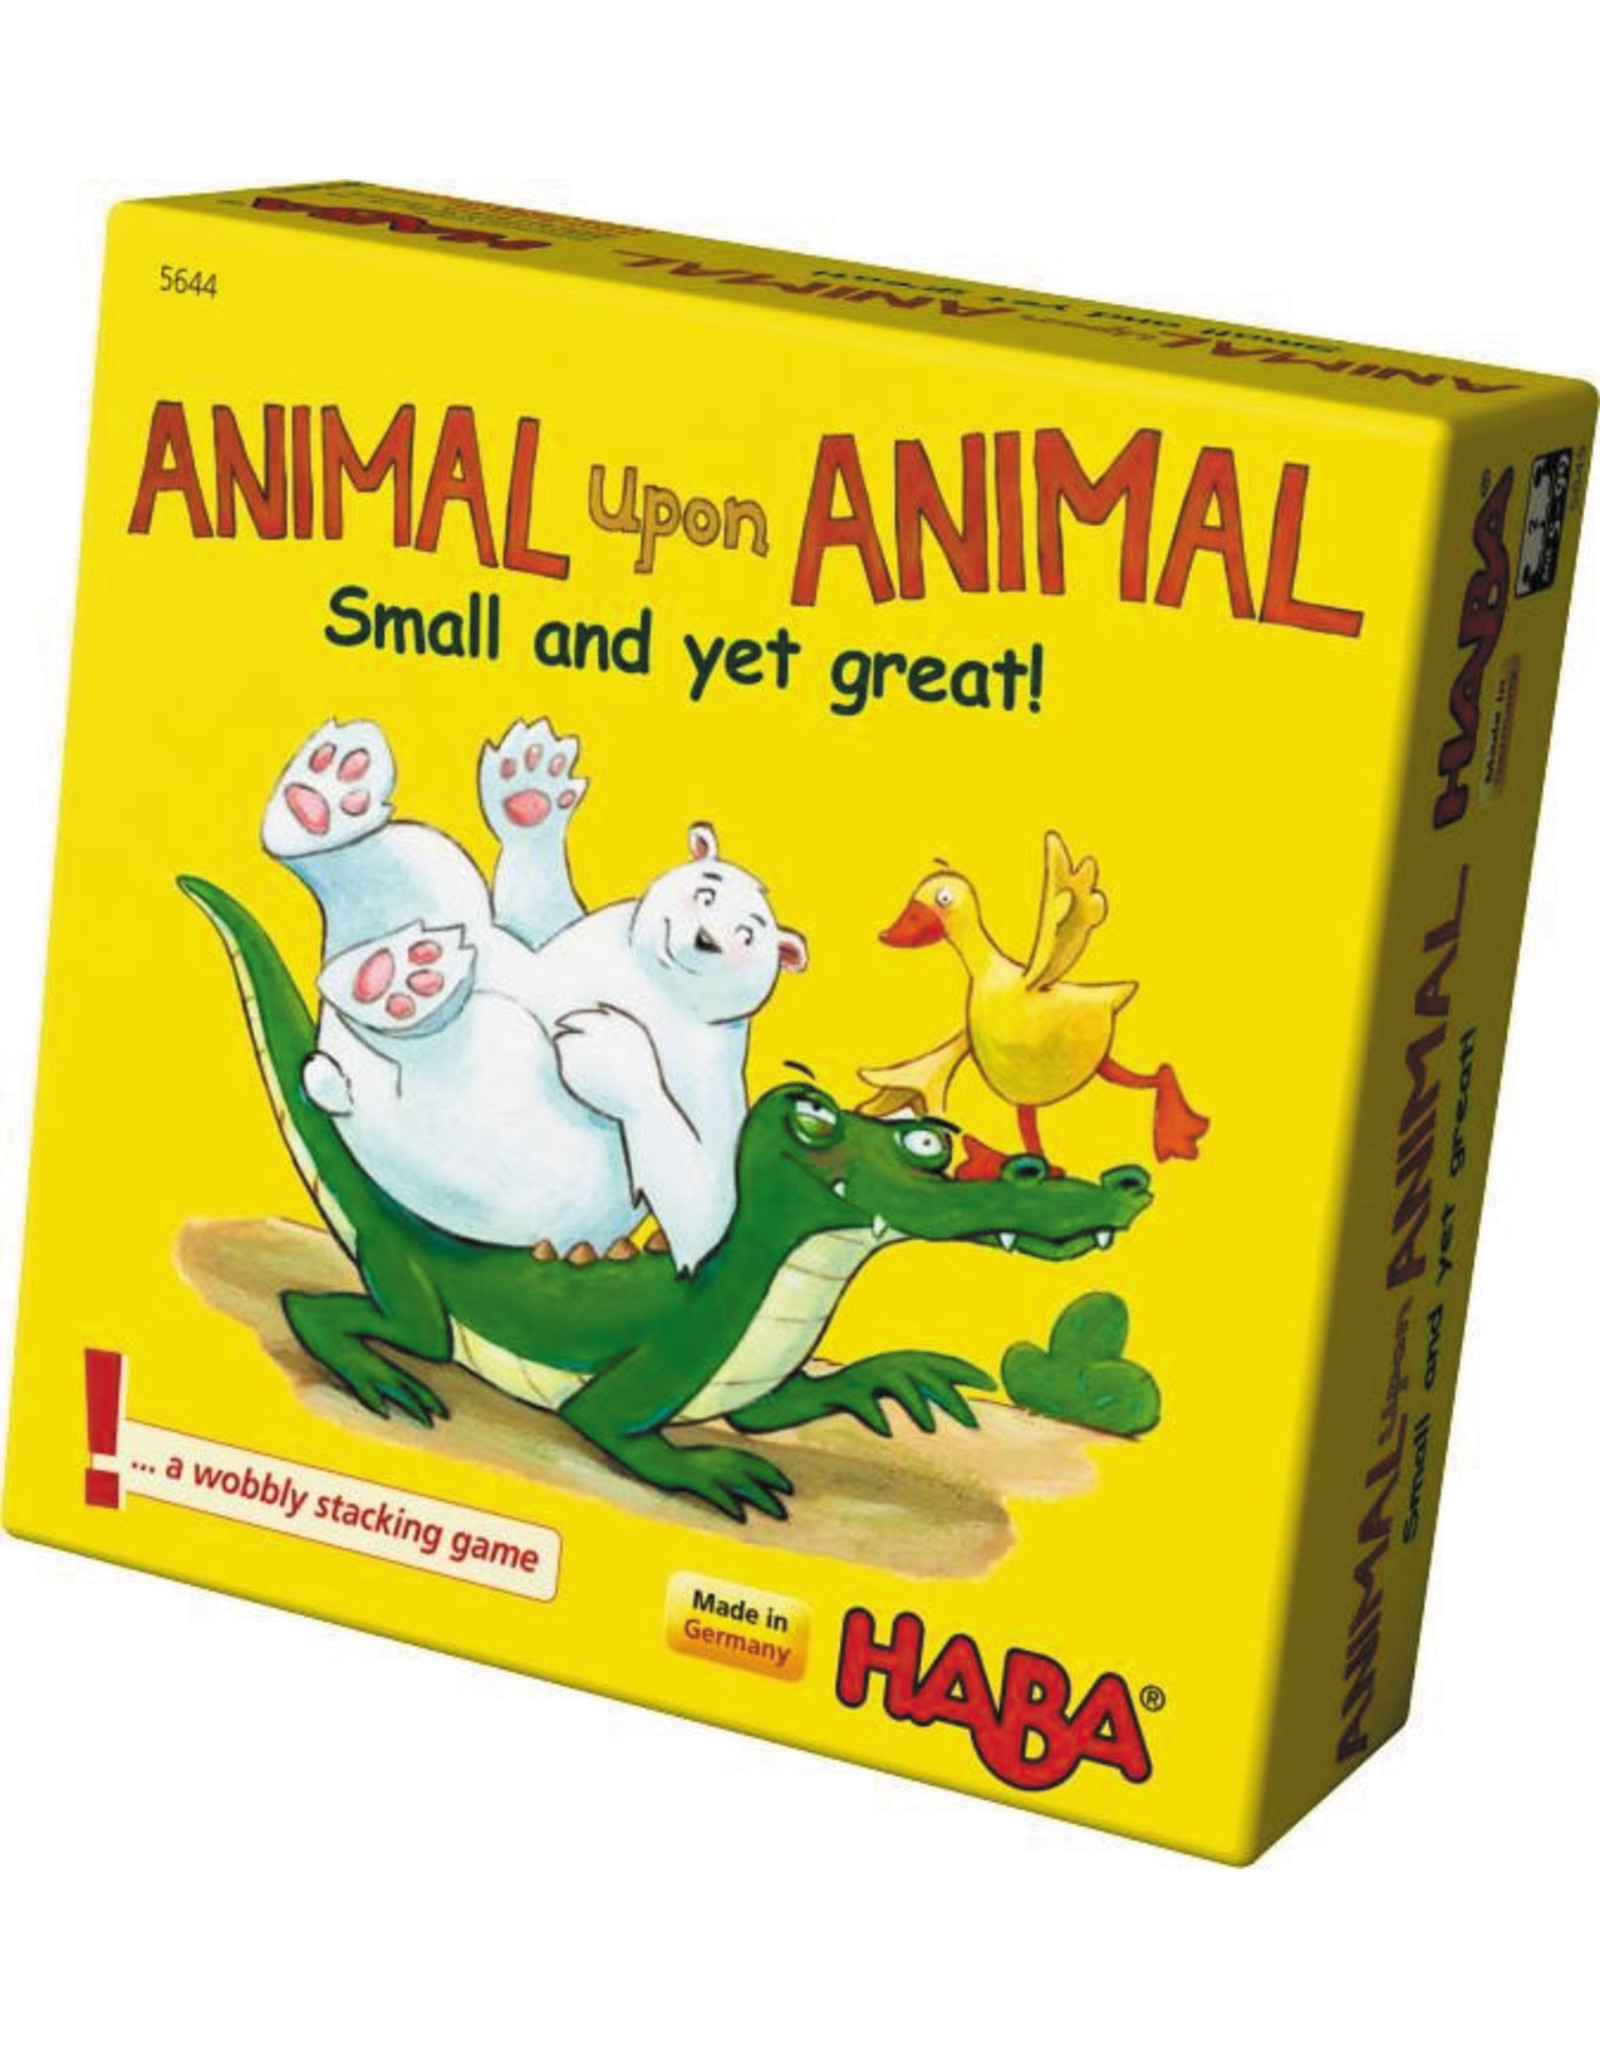 Haba Animal Upon Animal: Small, Yet Great!